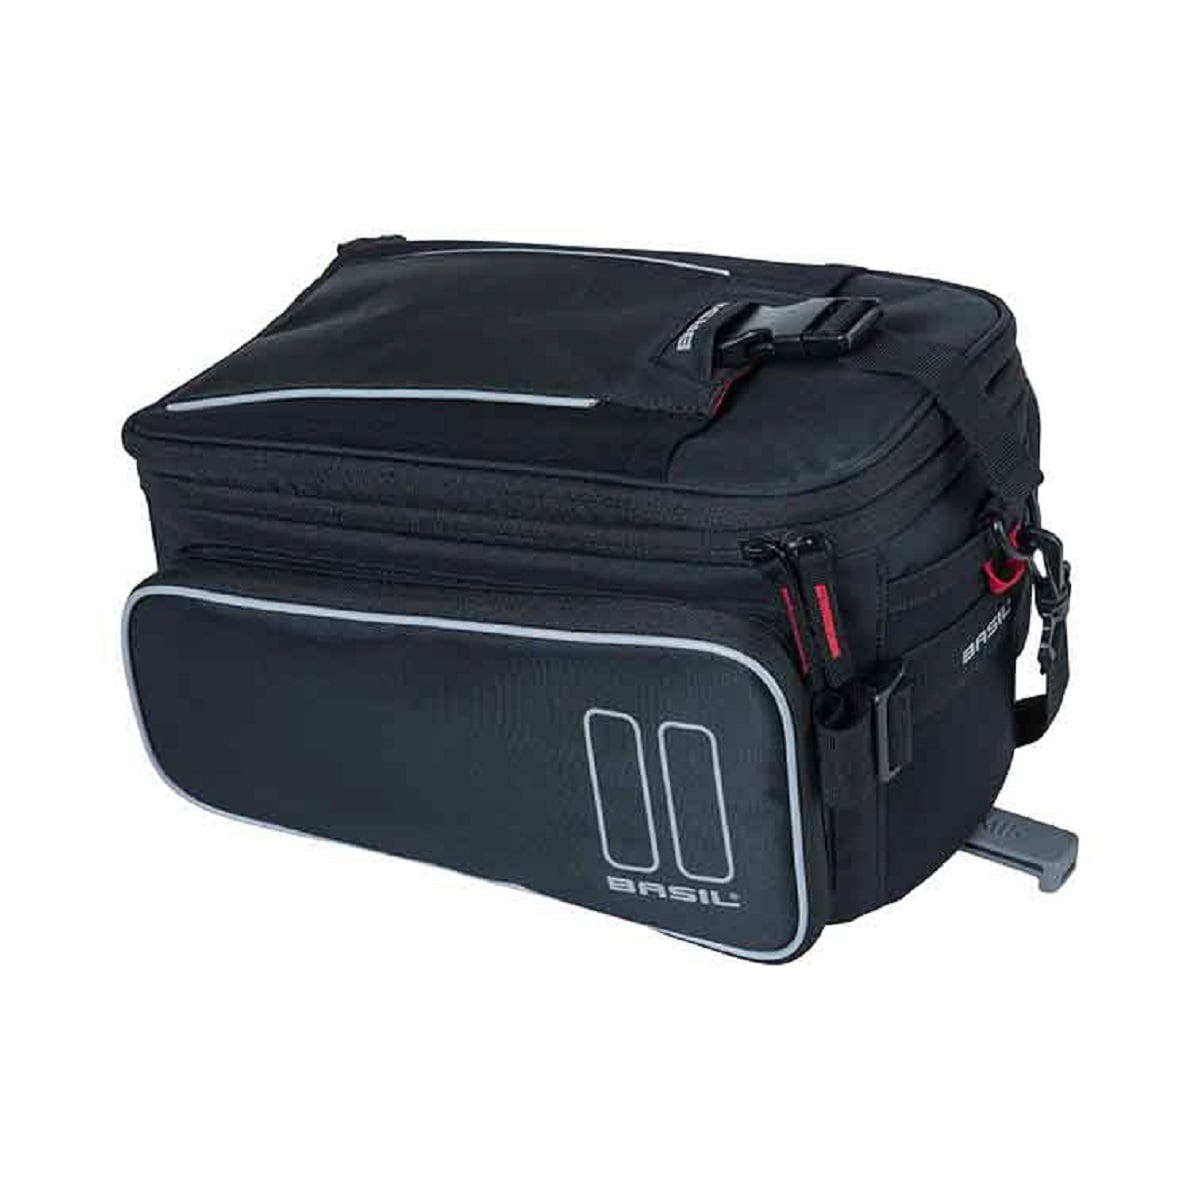 basil-sport-design-bagagedragertas-mik-7-15-liter-min